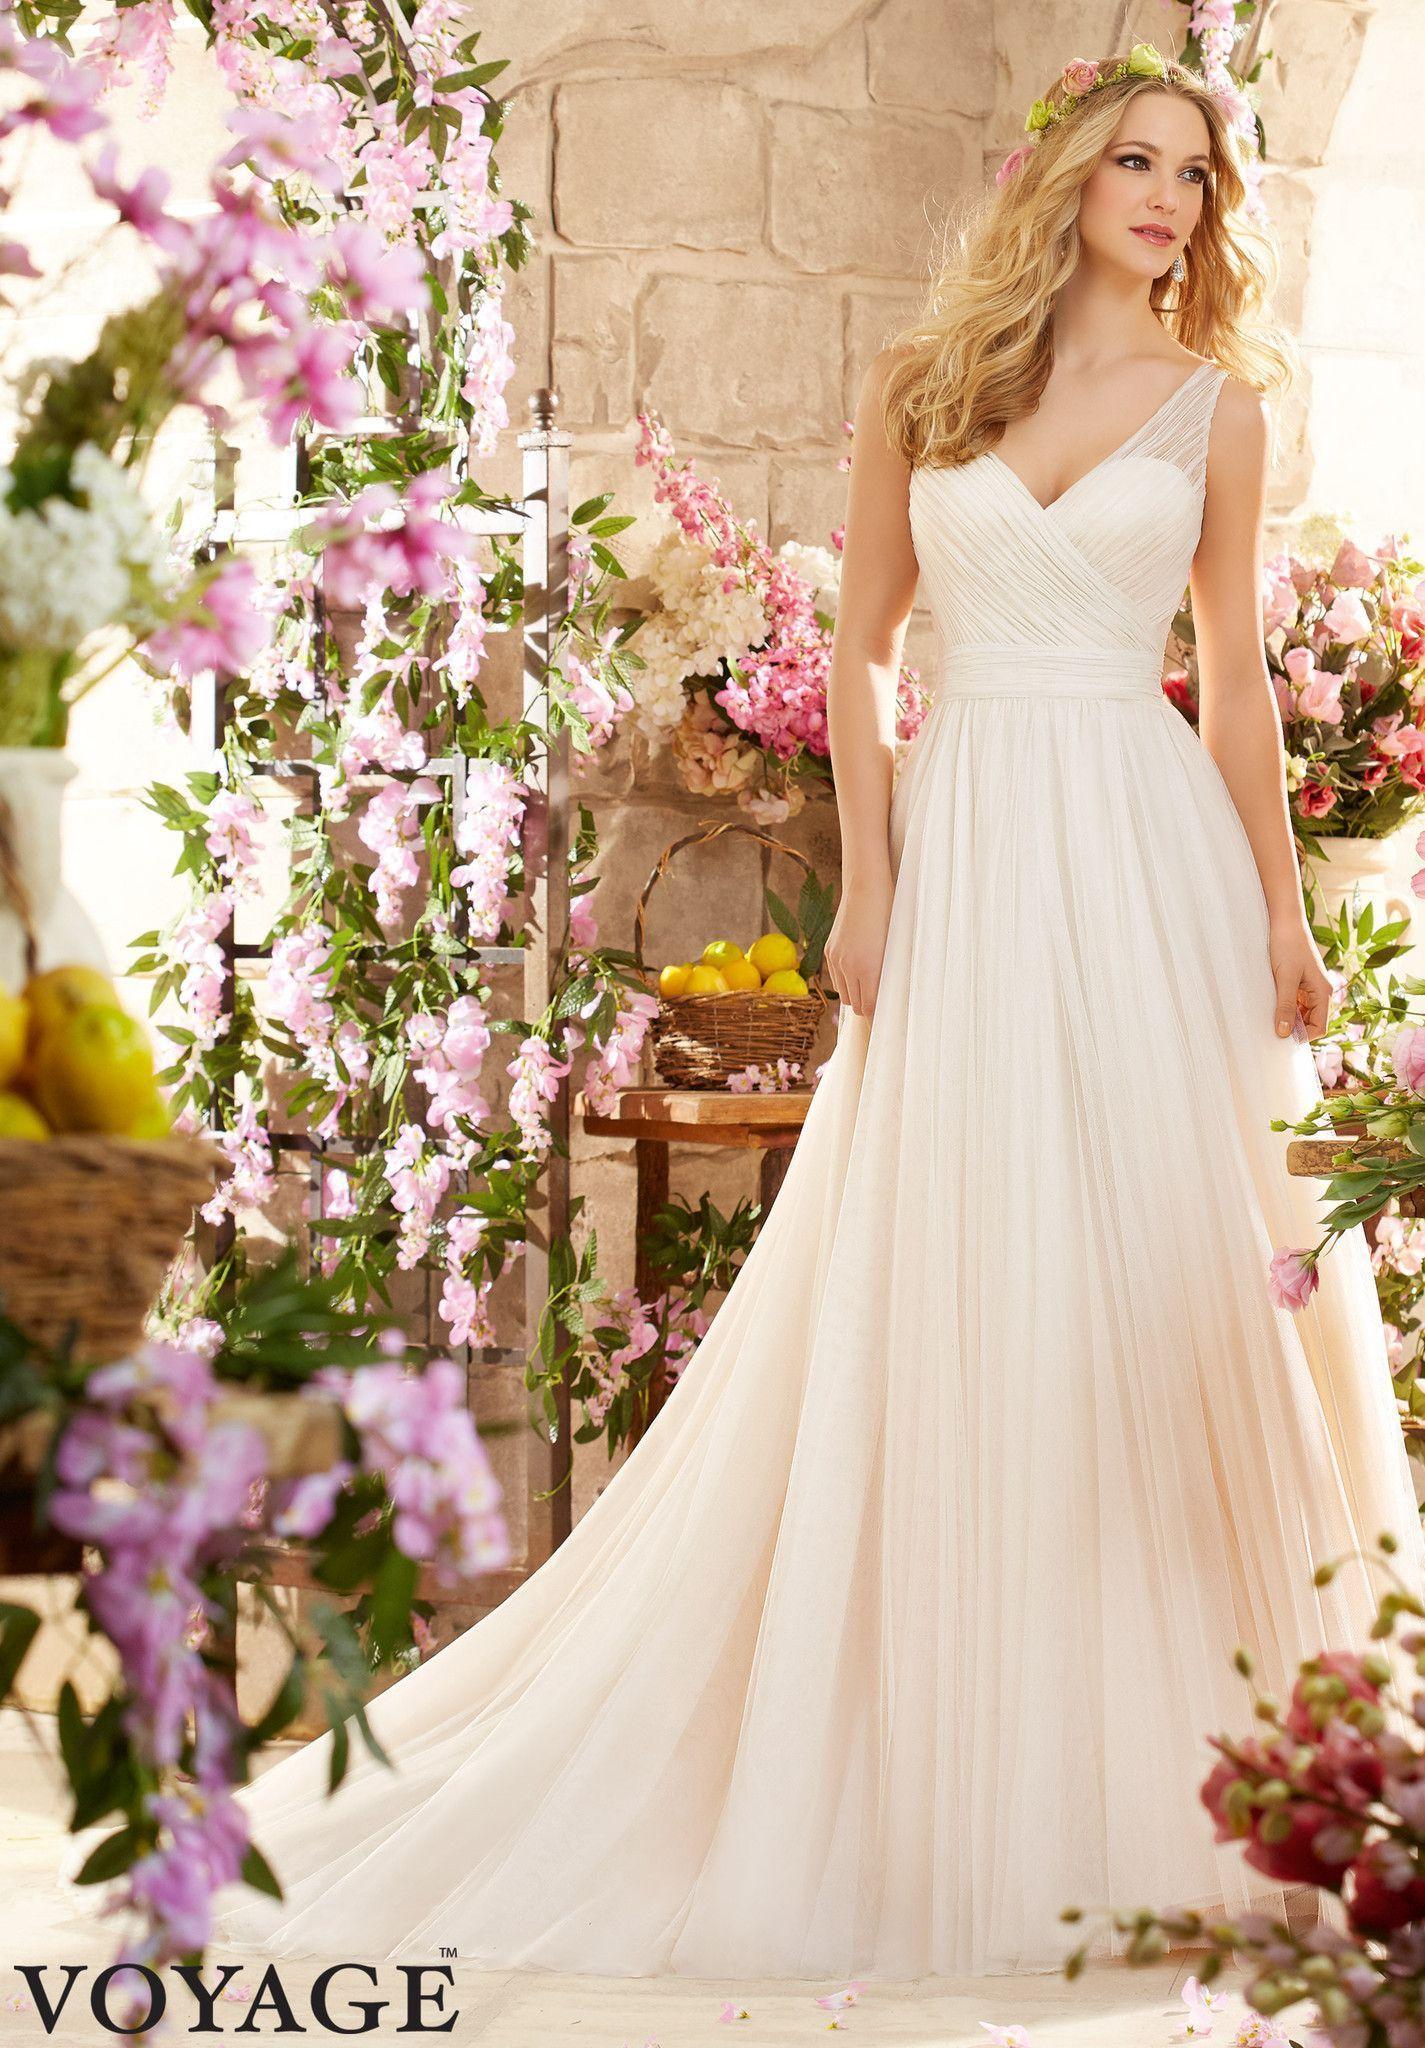 Voyage all dressed up bridal gown best wedding